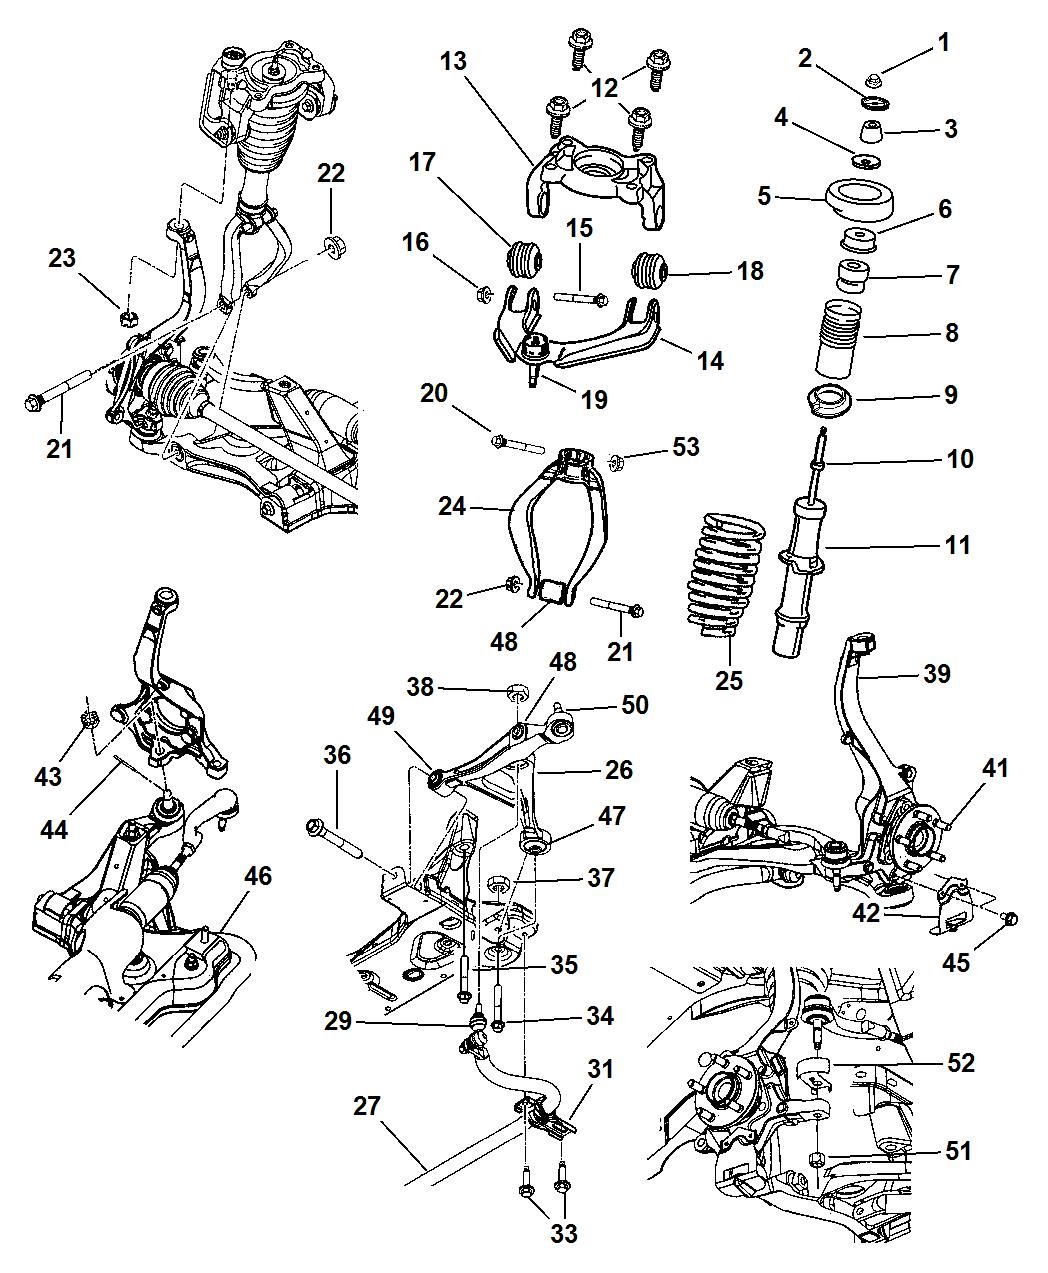 DW_7360] 2002 Dodge Suspension Diagram Schematic WiringOliti Gram Epsy Terch Dimet Mecad Elae Mohammedshrine Librar Wiring 101